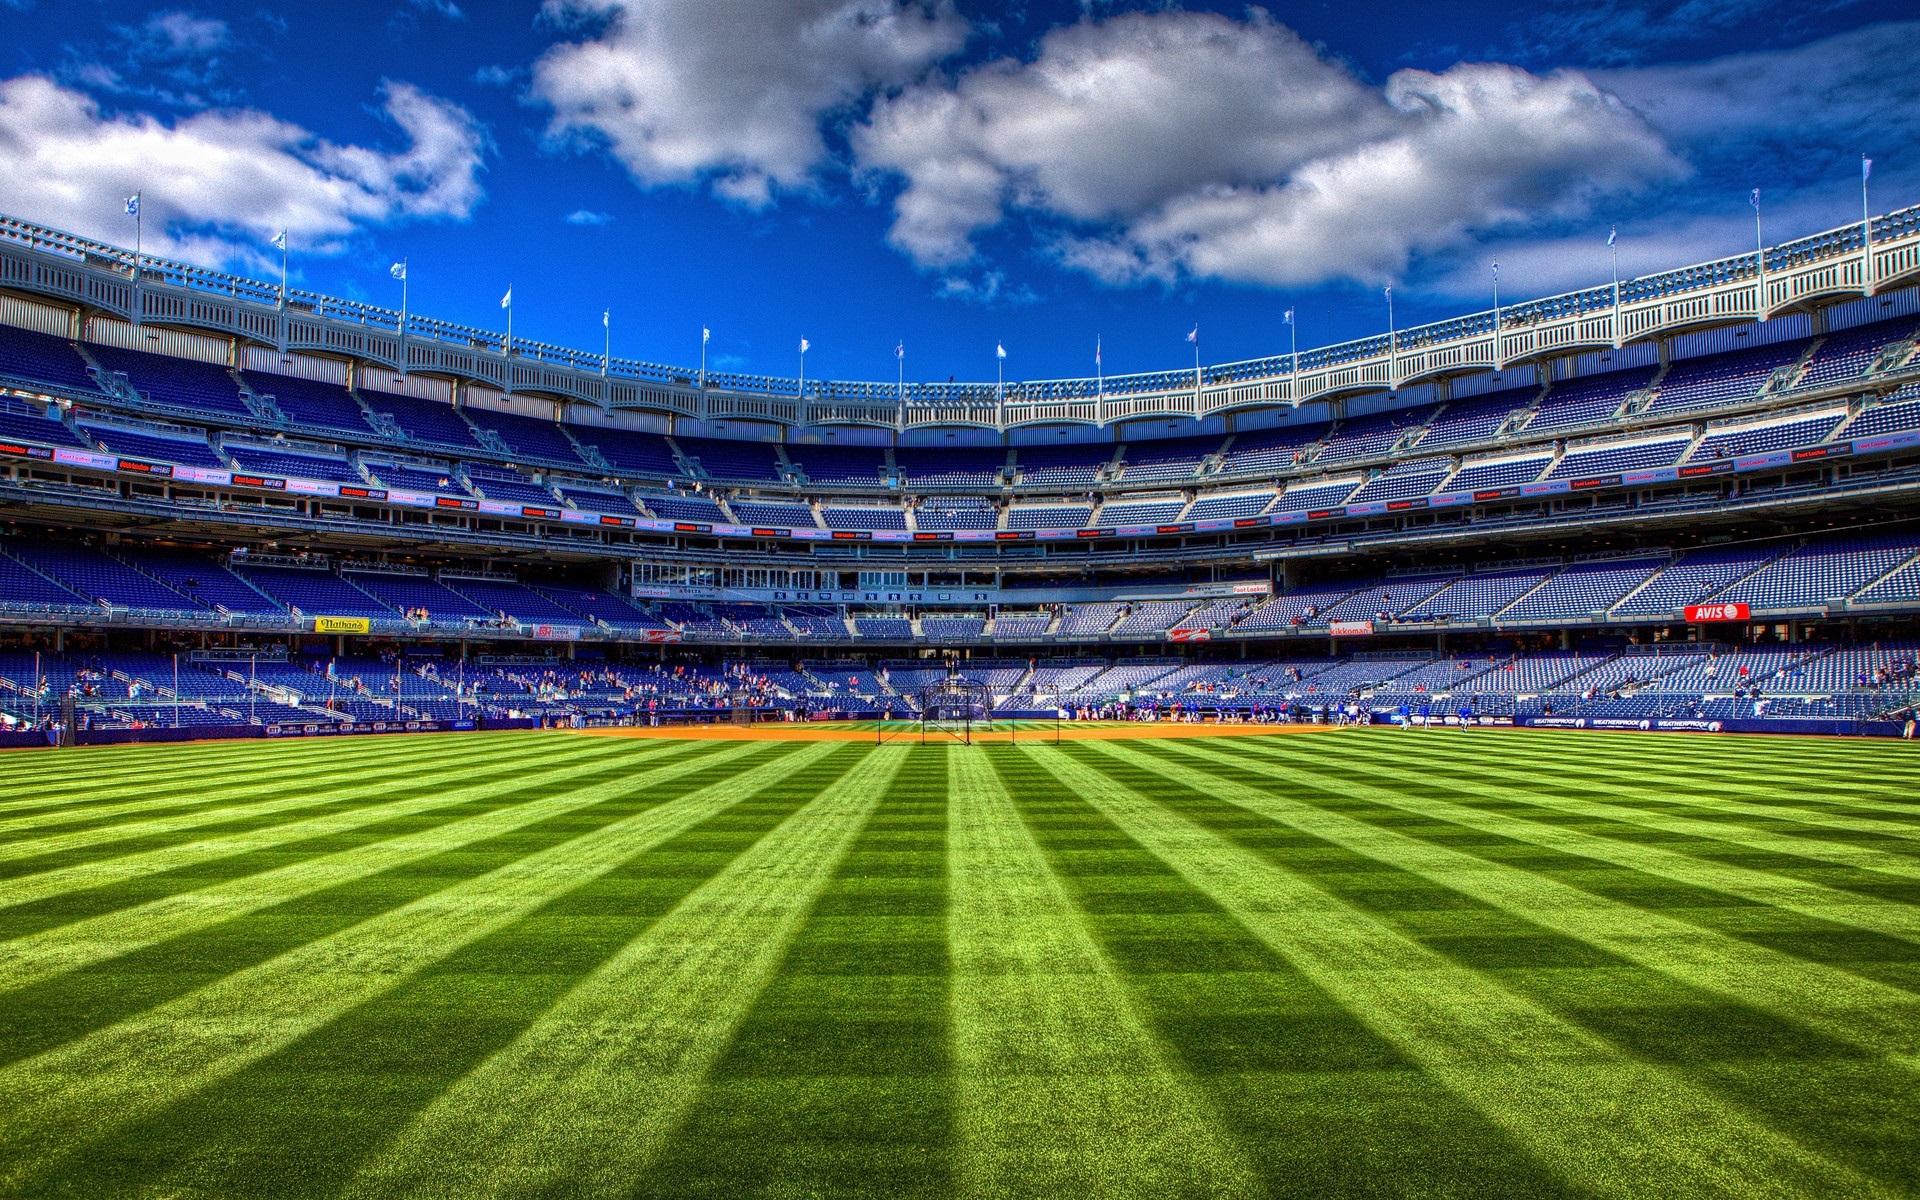 Fondos de pantalla estadios deportivos f tbol c sped for Fondos de pantalla de futbol para celular